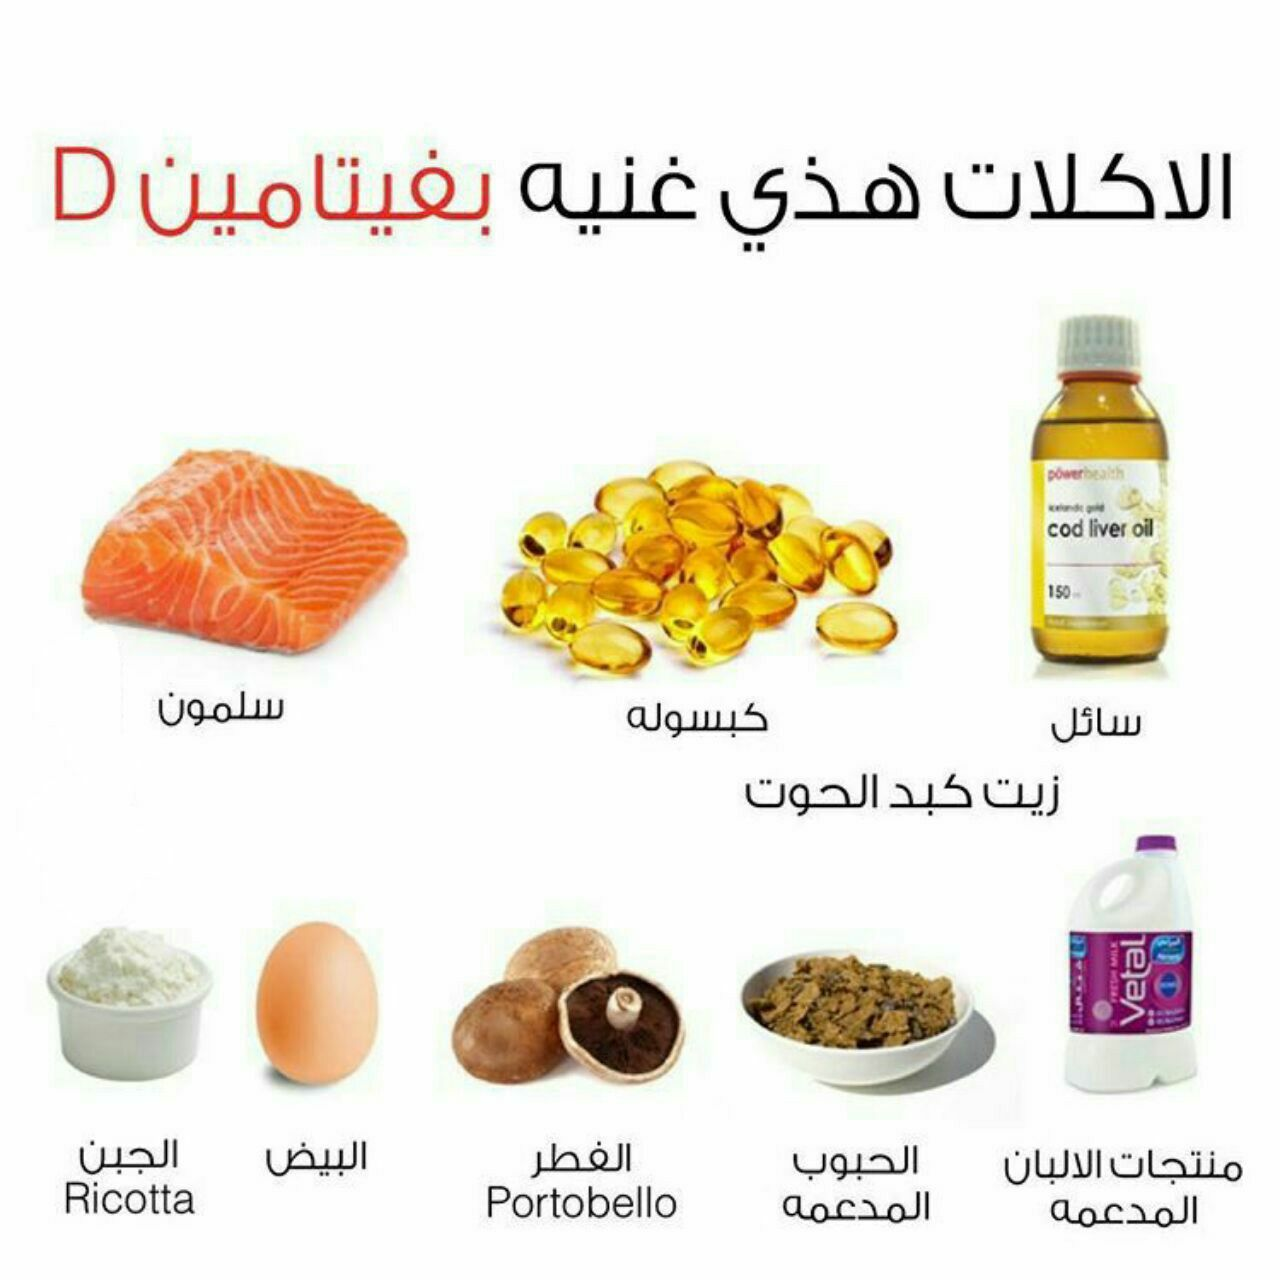 Pin By Hassan On الصحة والجمال Food Medicine Dog Food Recipes Food